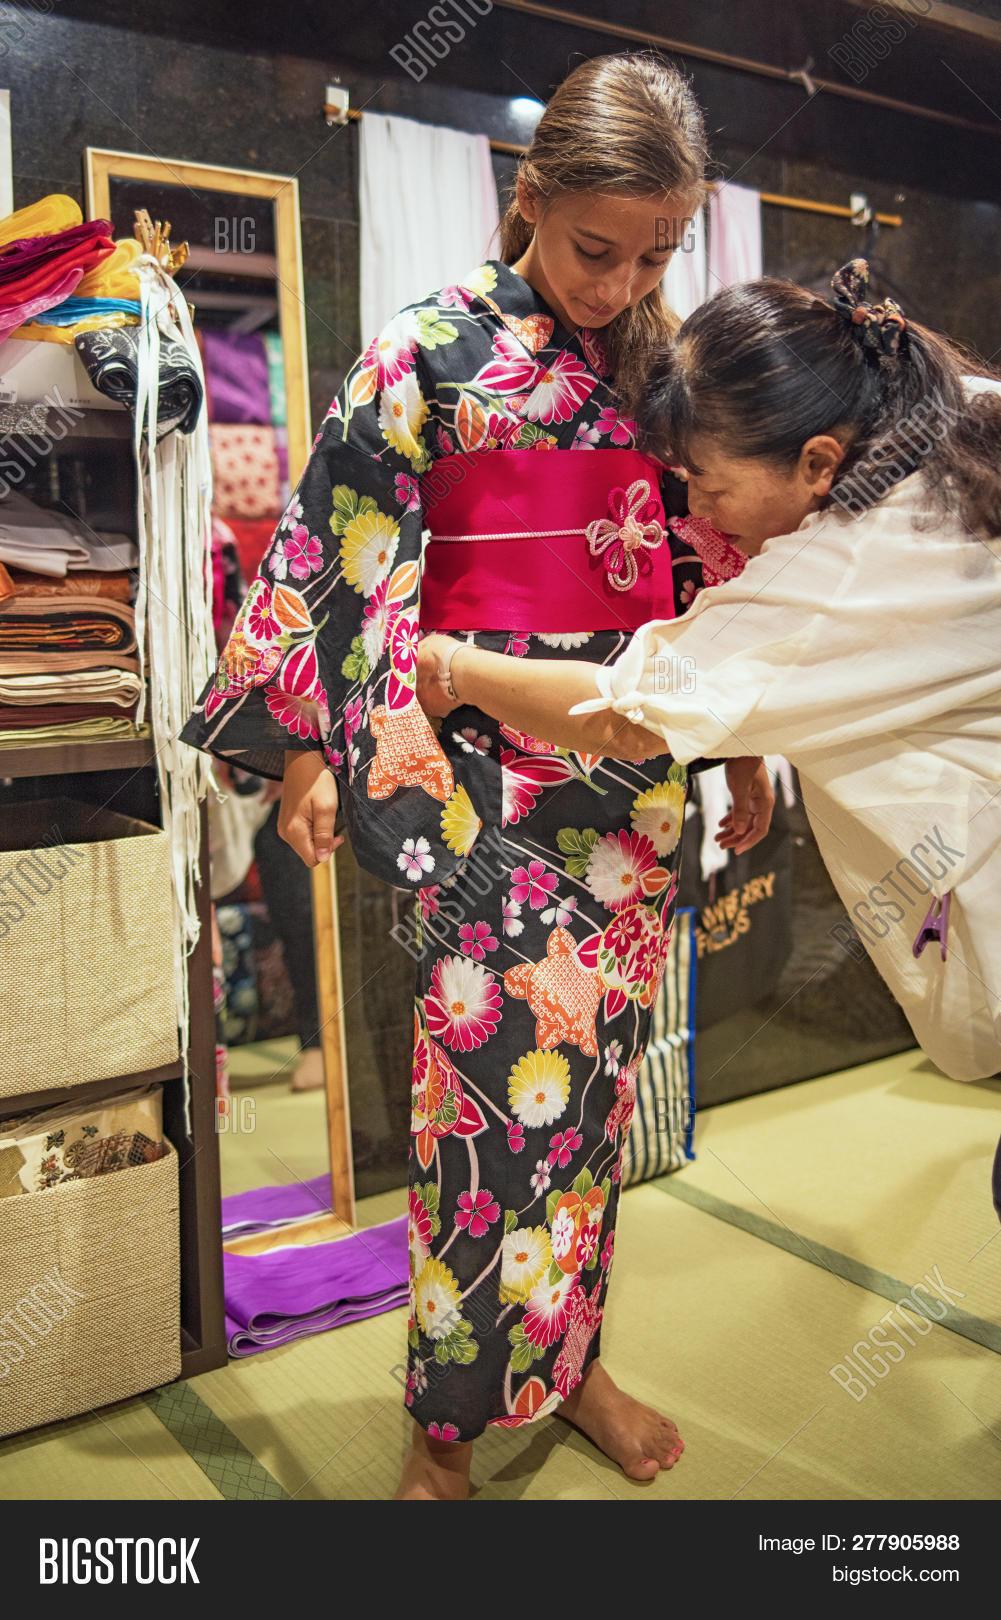 ca0fabc7b5aa4 Pretty Girl Kimono. Image & Photo (Free Trial) | Bigstock